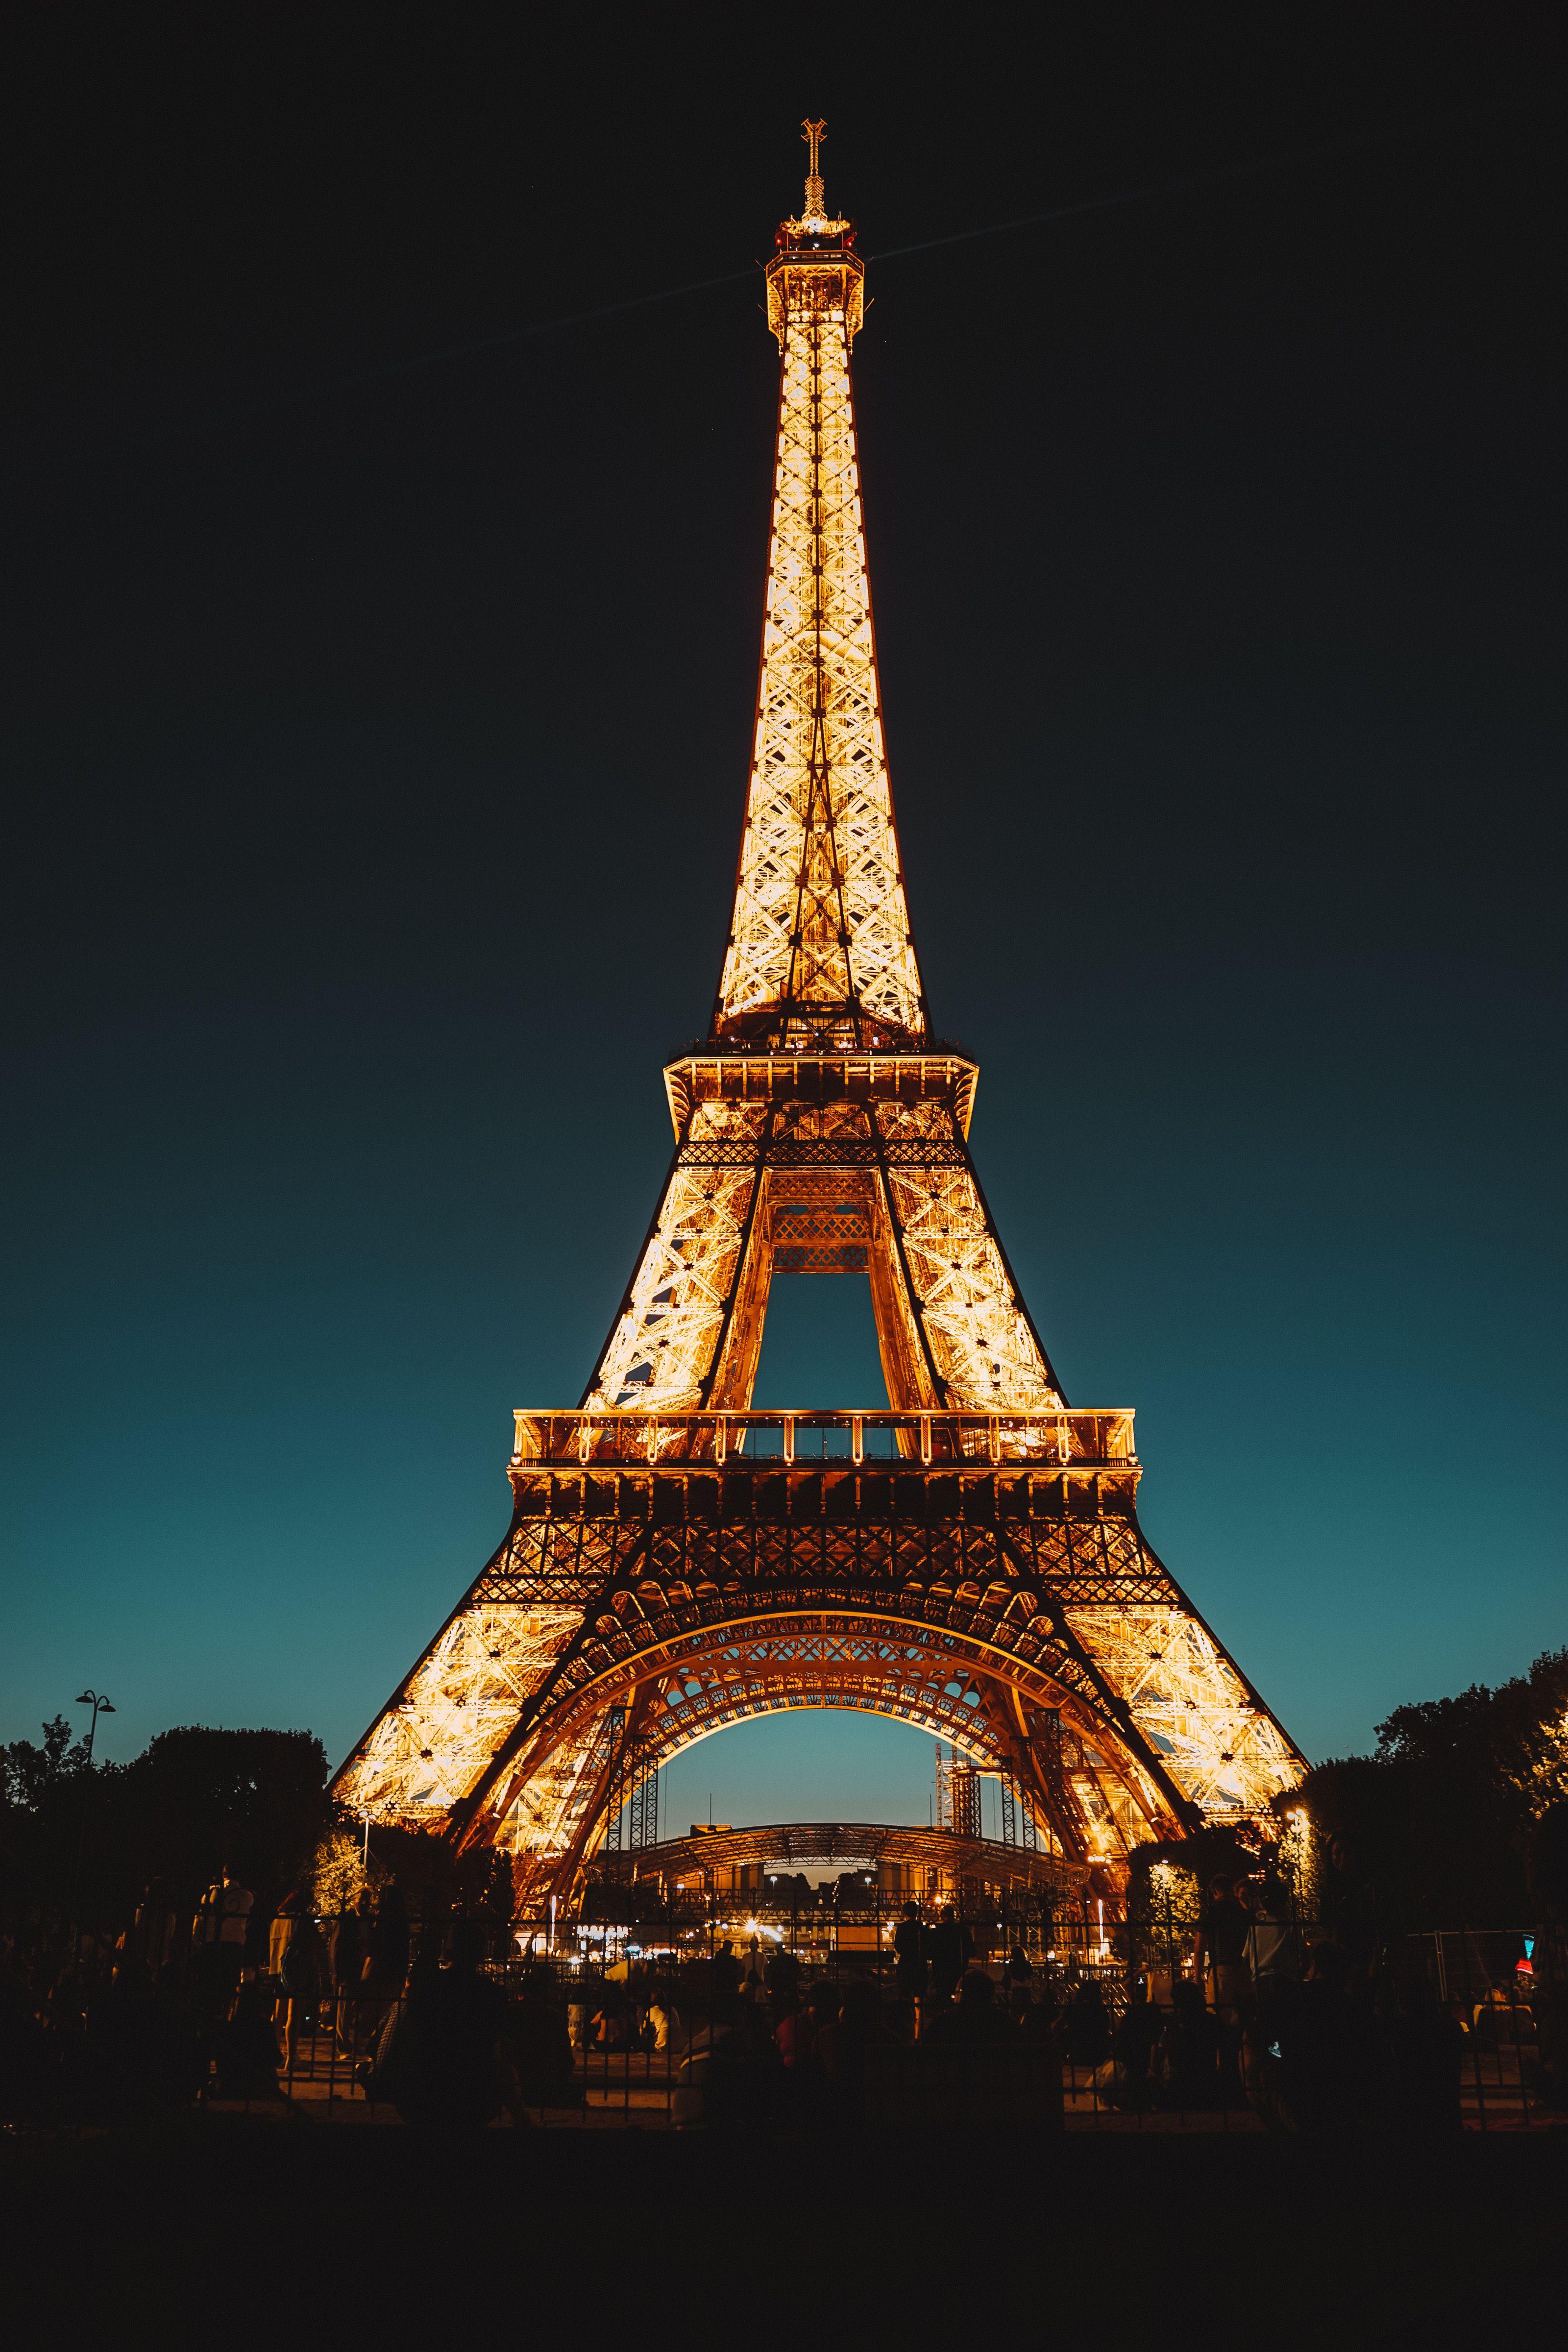 Paris Photography Eiffel Tower At Night Paris Photography Eiffel Tower Eiffel Tower At Night Eiffel Tower Photography